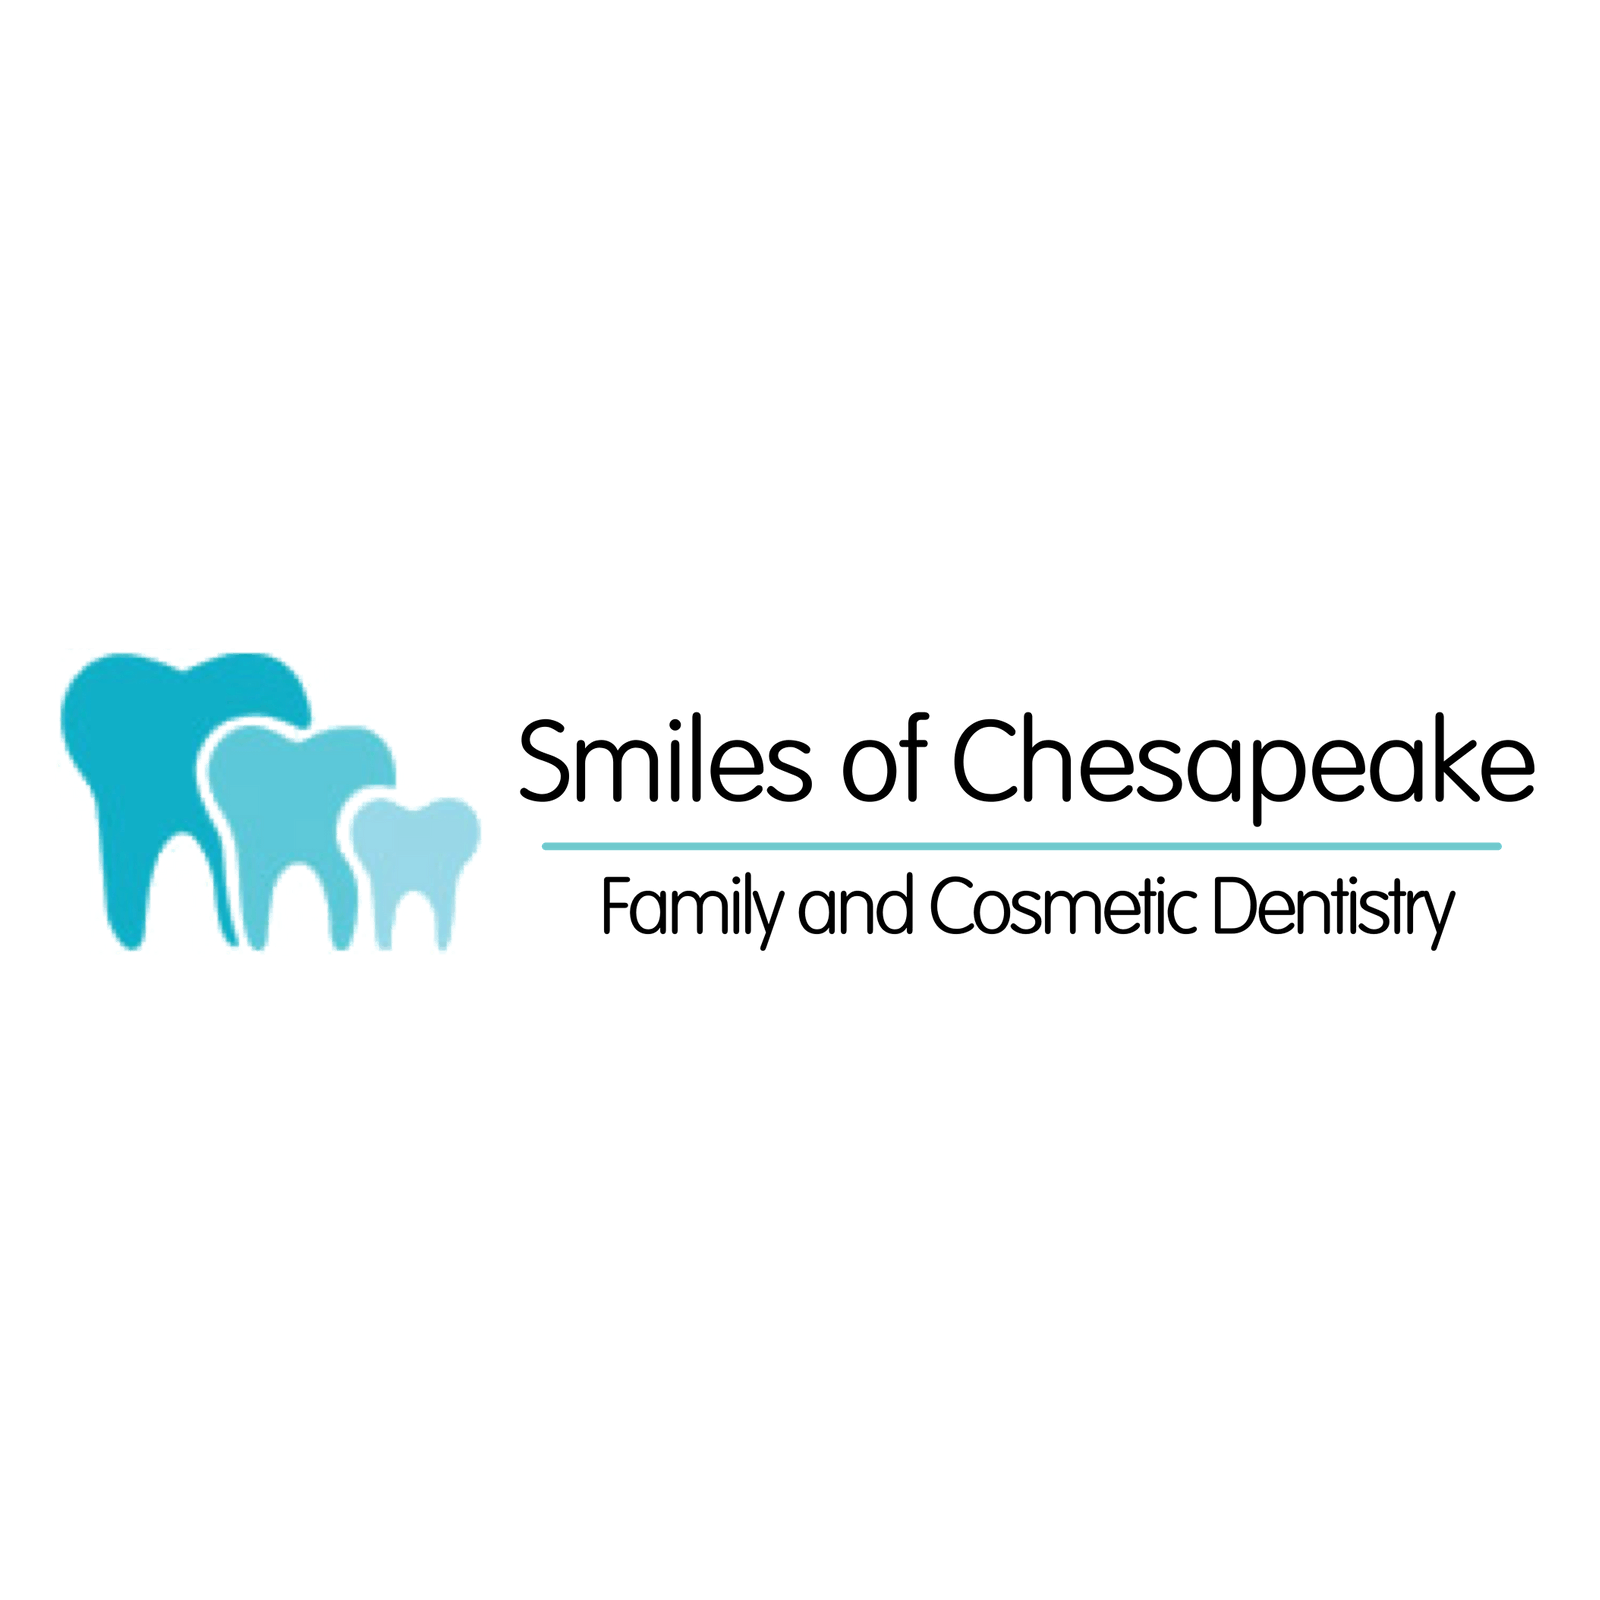 Dentist Chesapeake - Smiles of Chesapeake